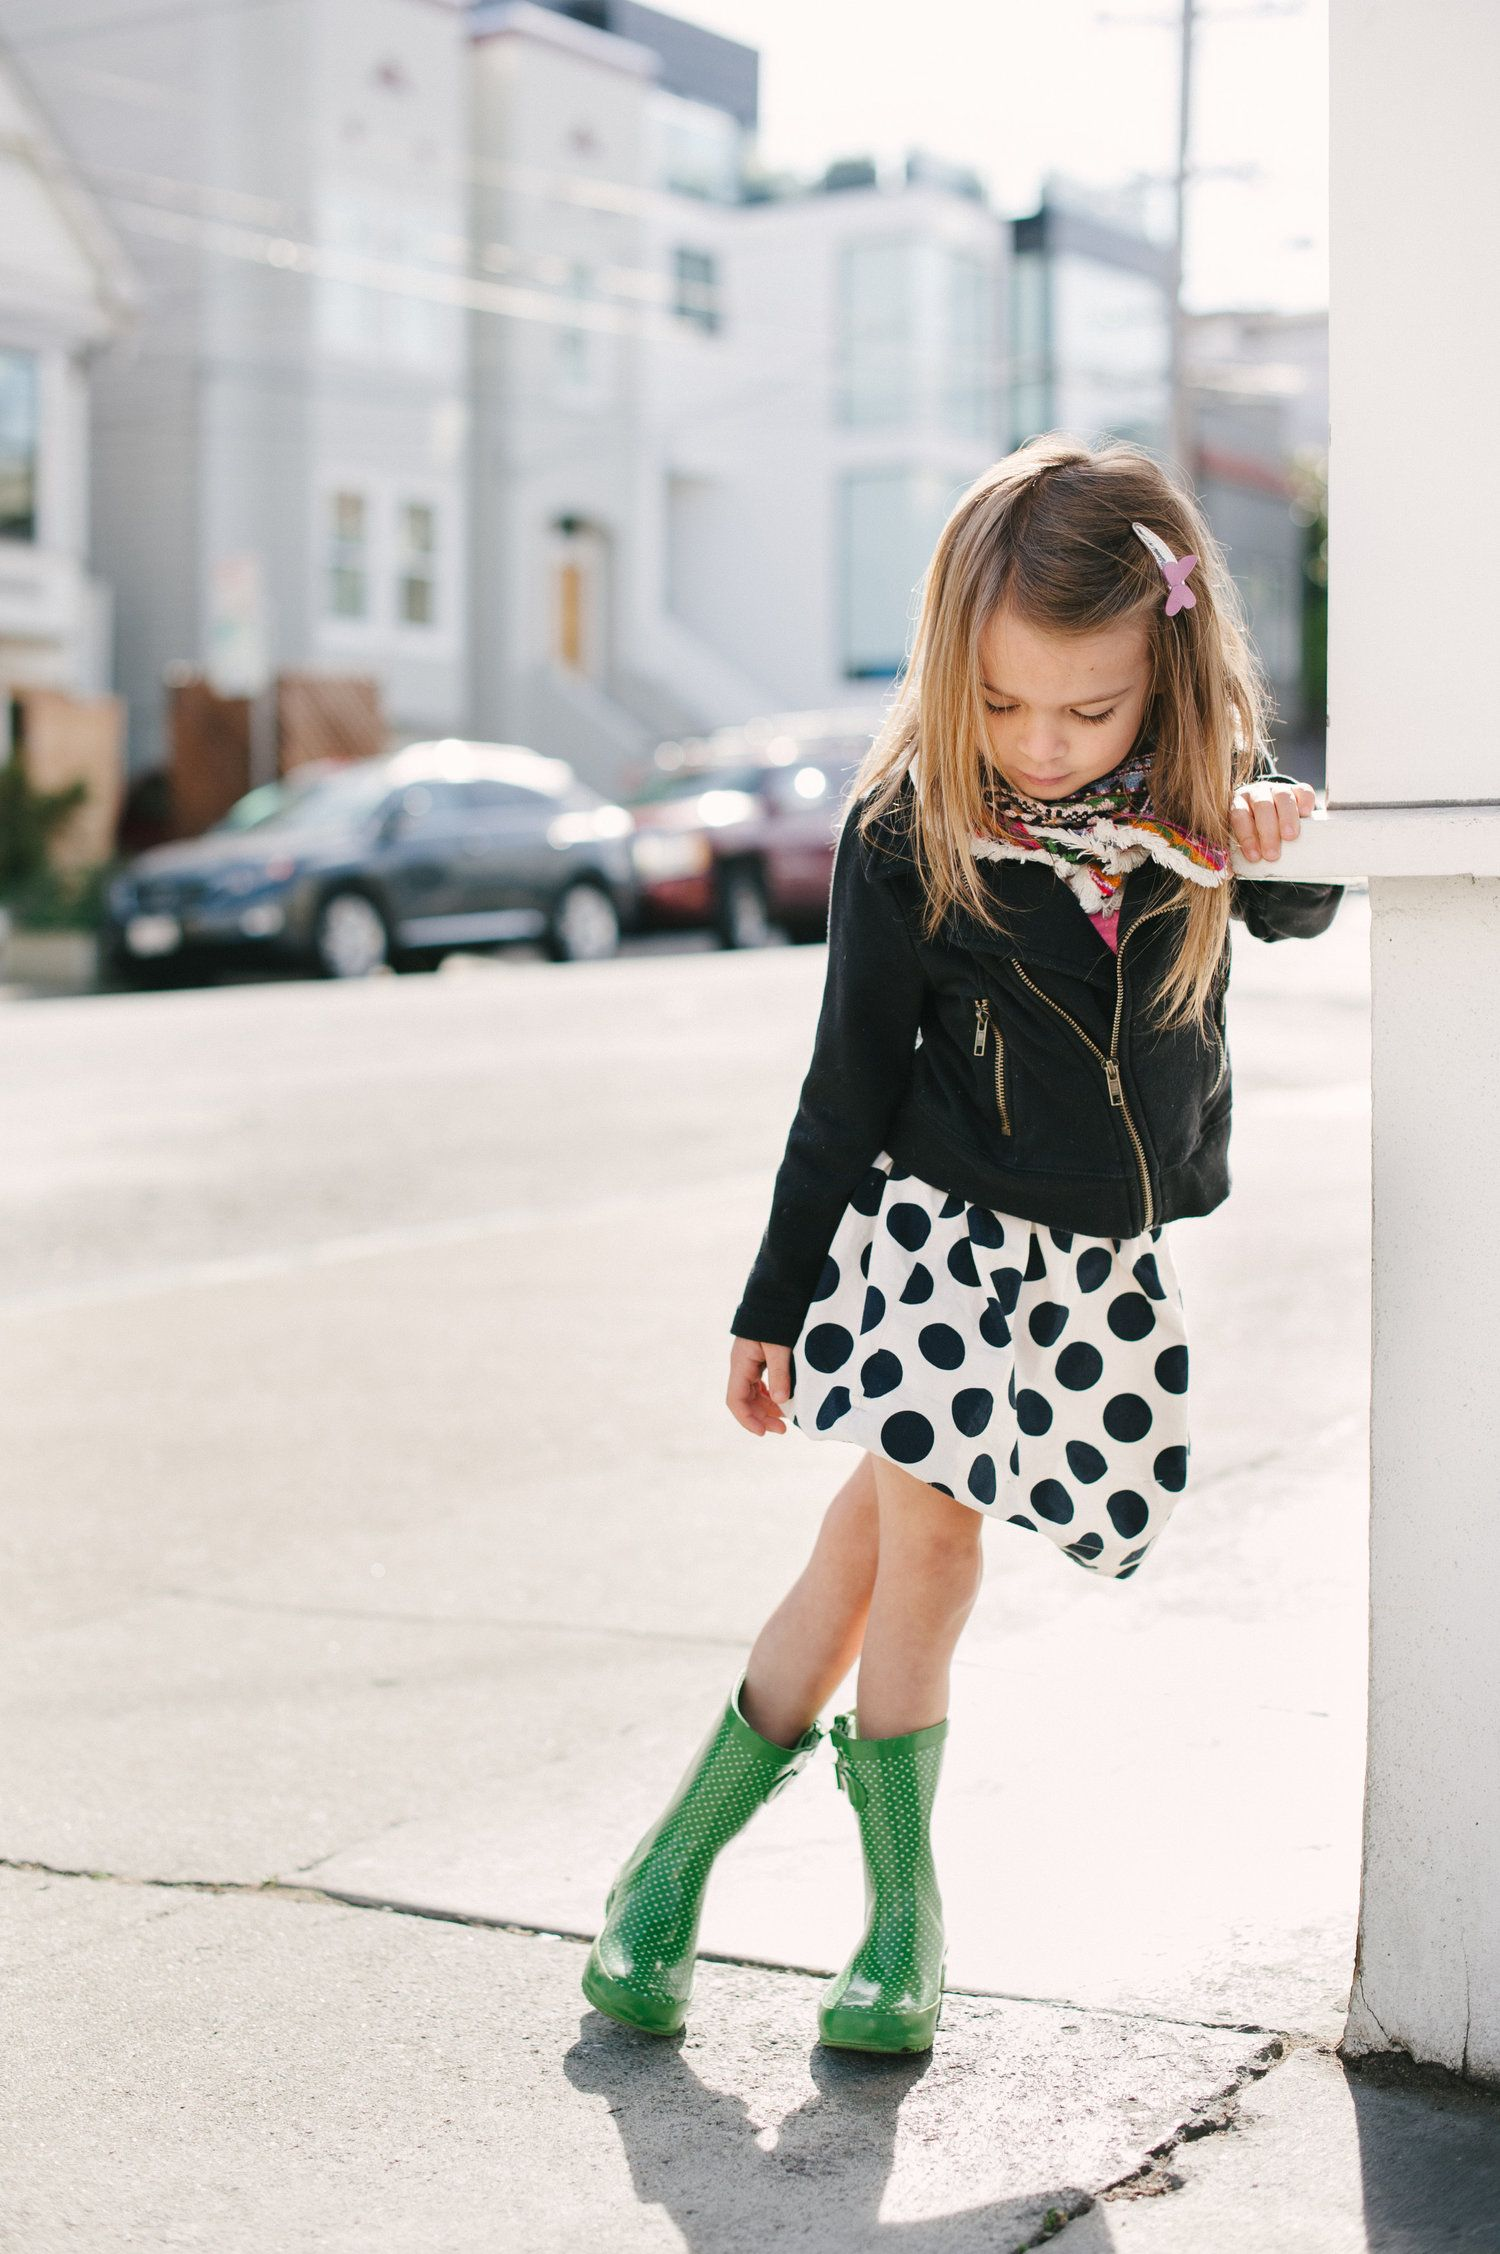 His & Her Children's Clothing| Serafini Amelia| Style Smaller | Blog + Shop